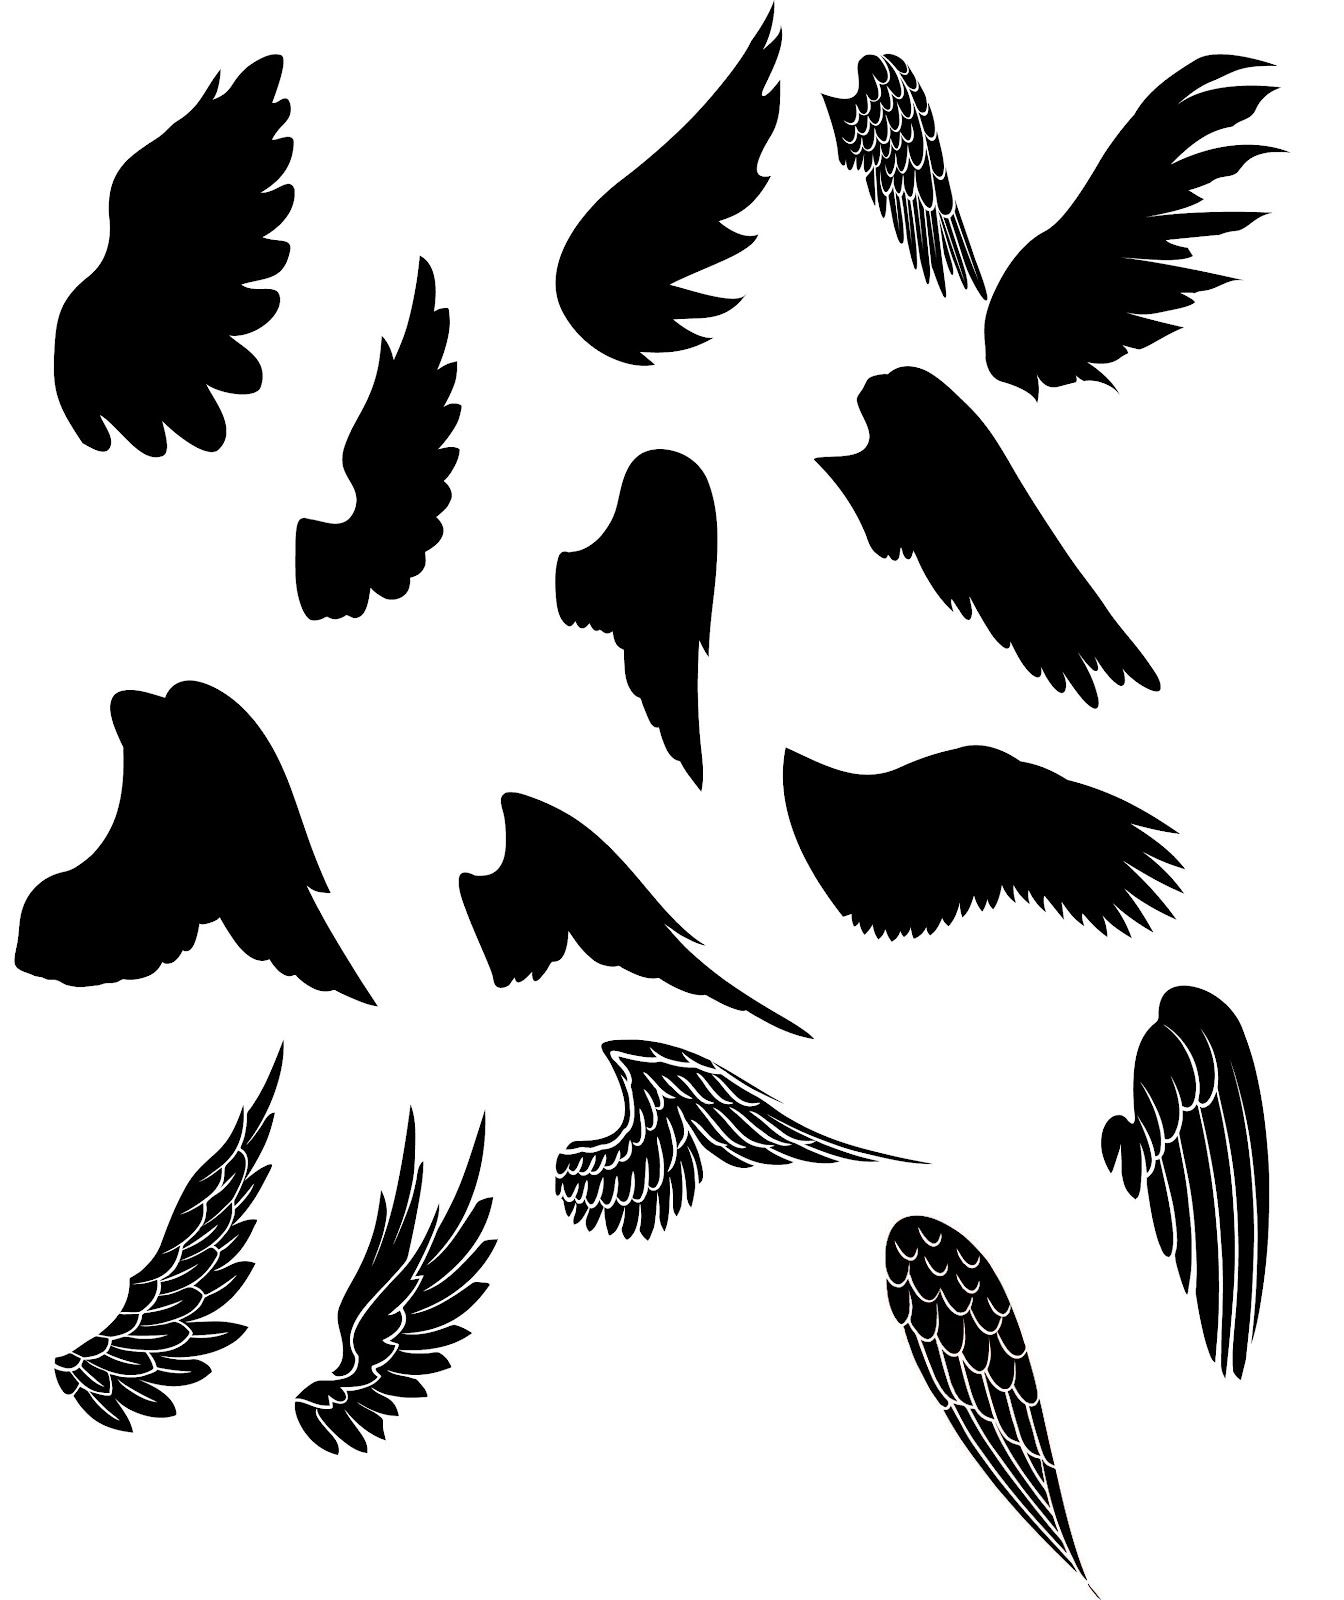 wings svg free #1195, Download drawings